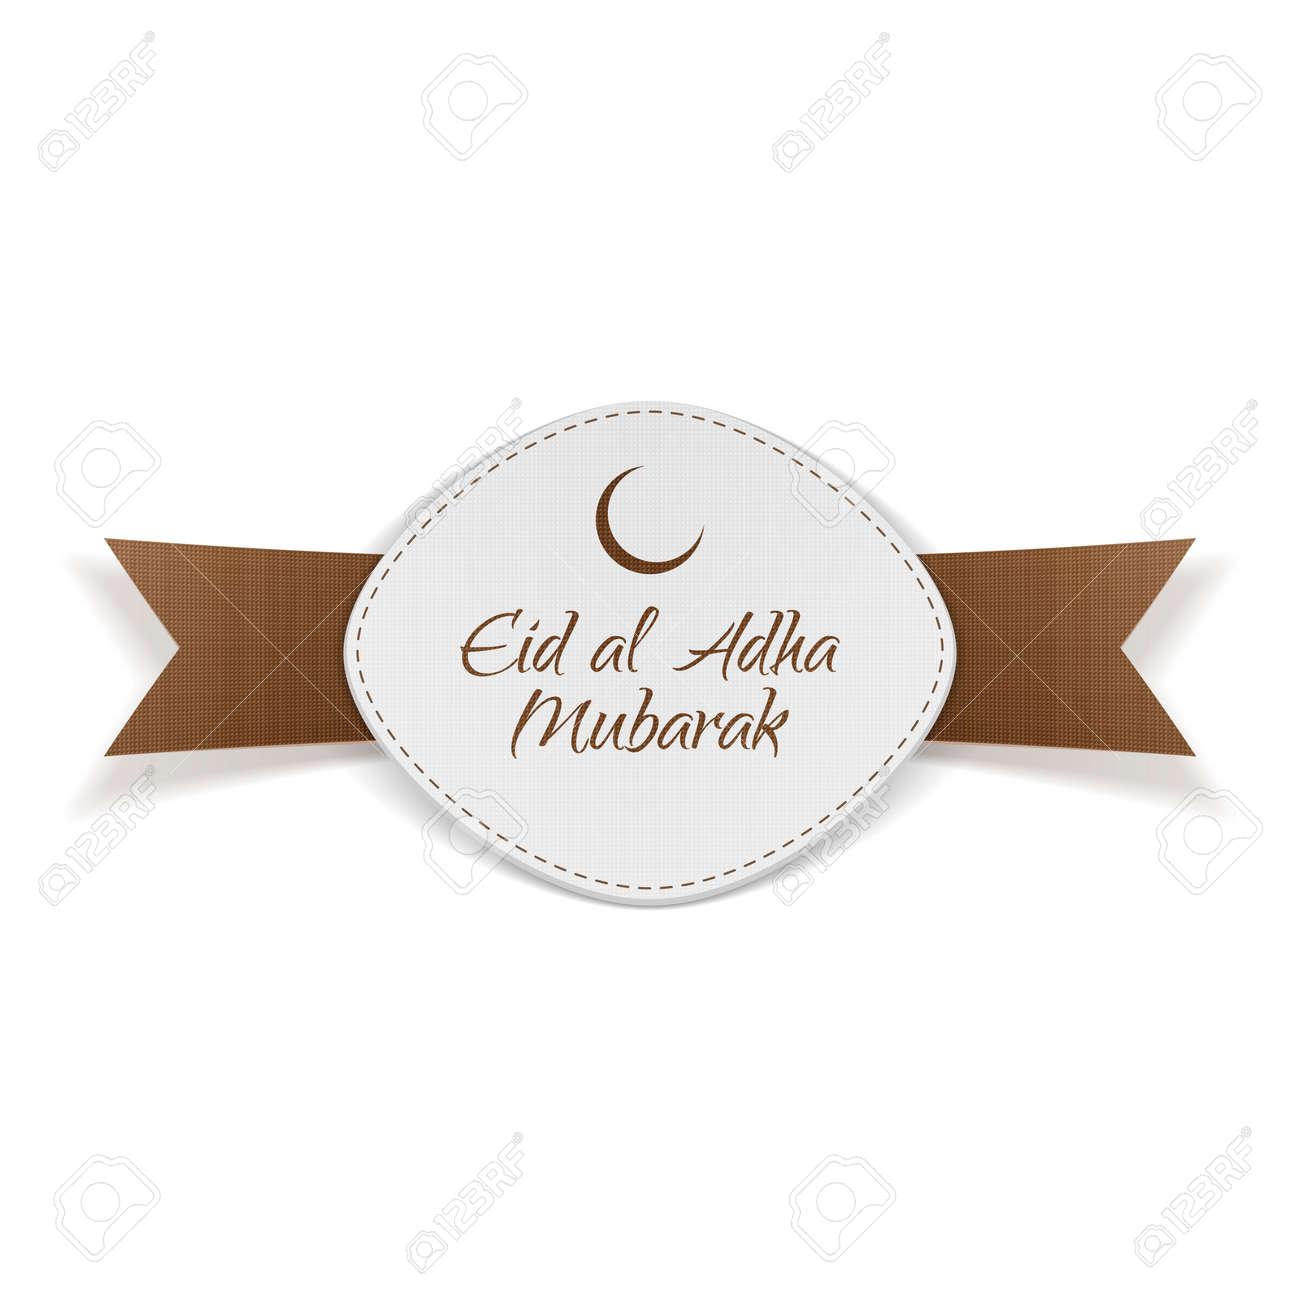 Eid Al Adha Mubarak Banner With Ribbon Isolated On White Background